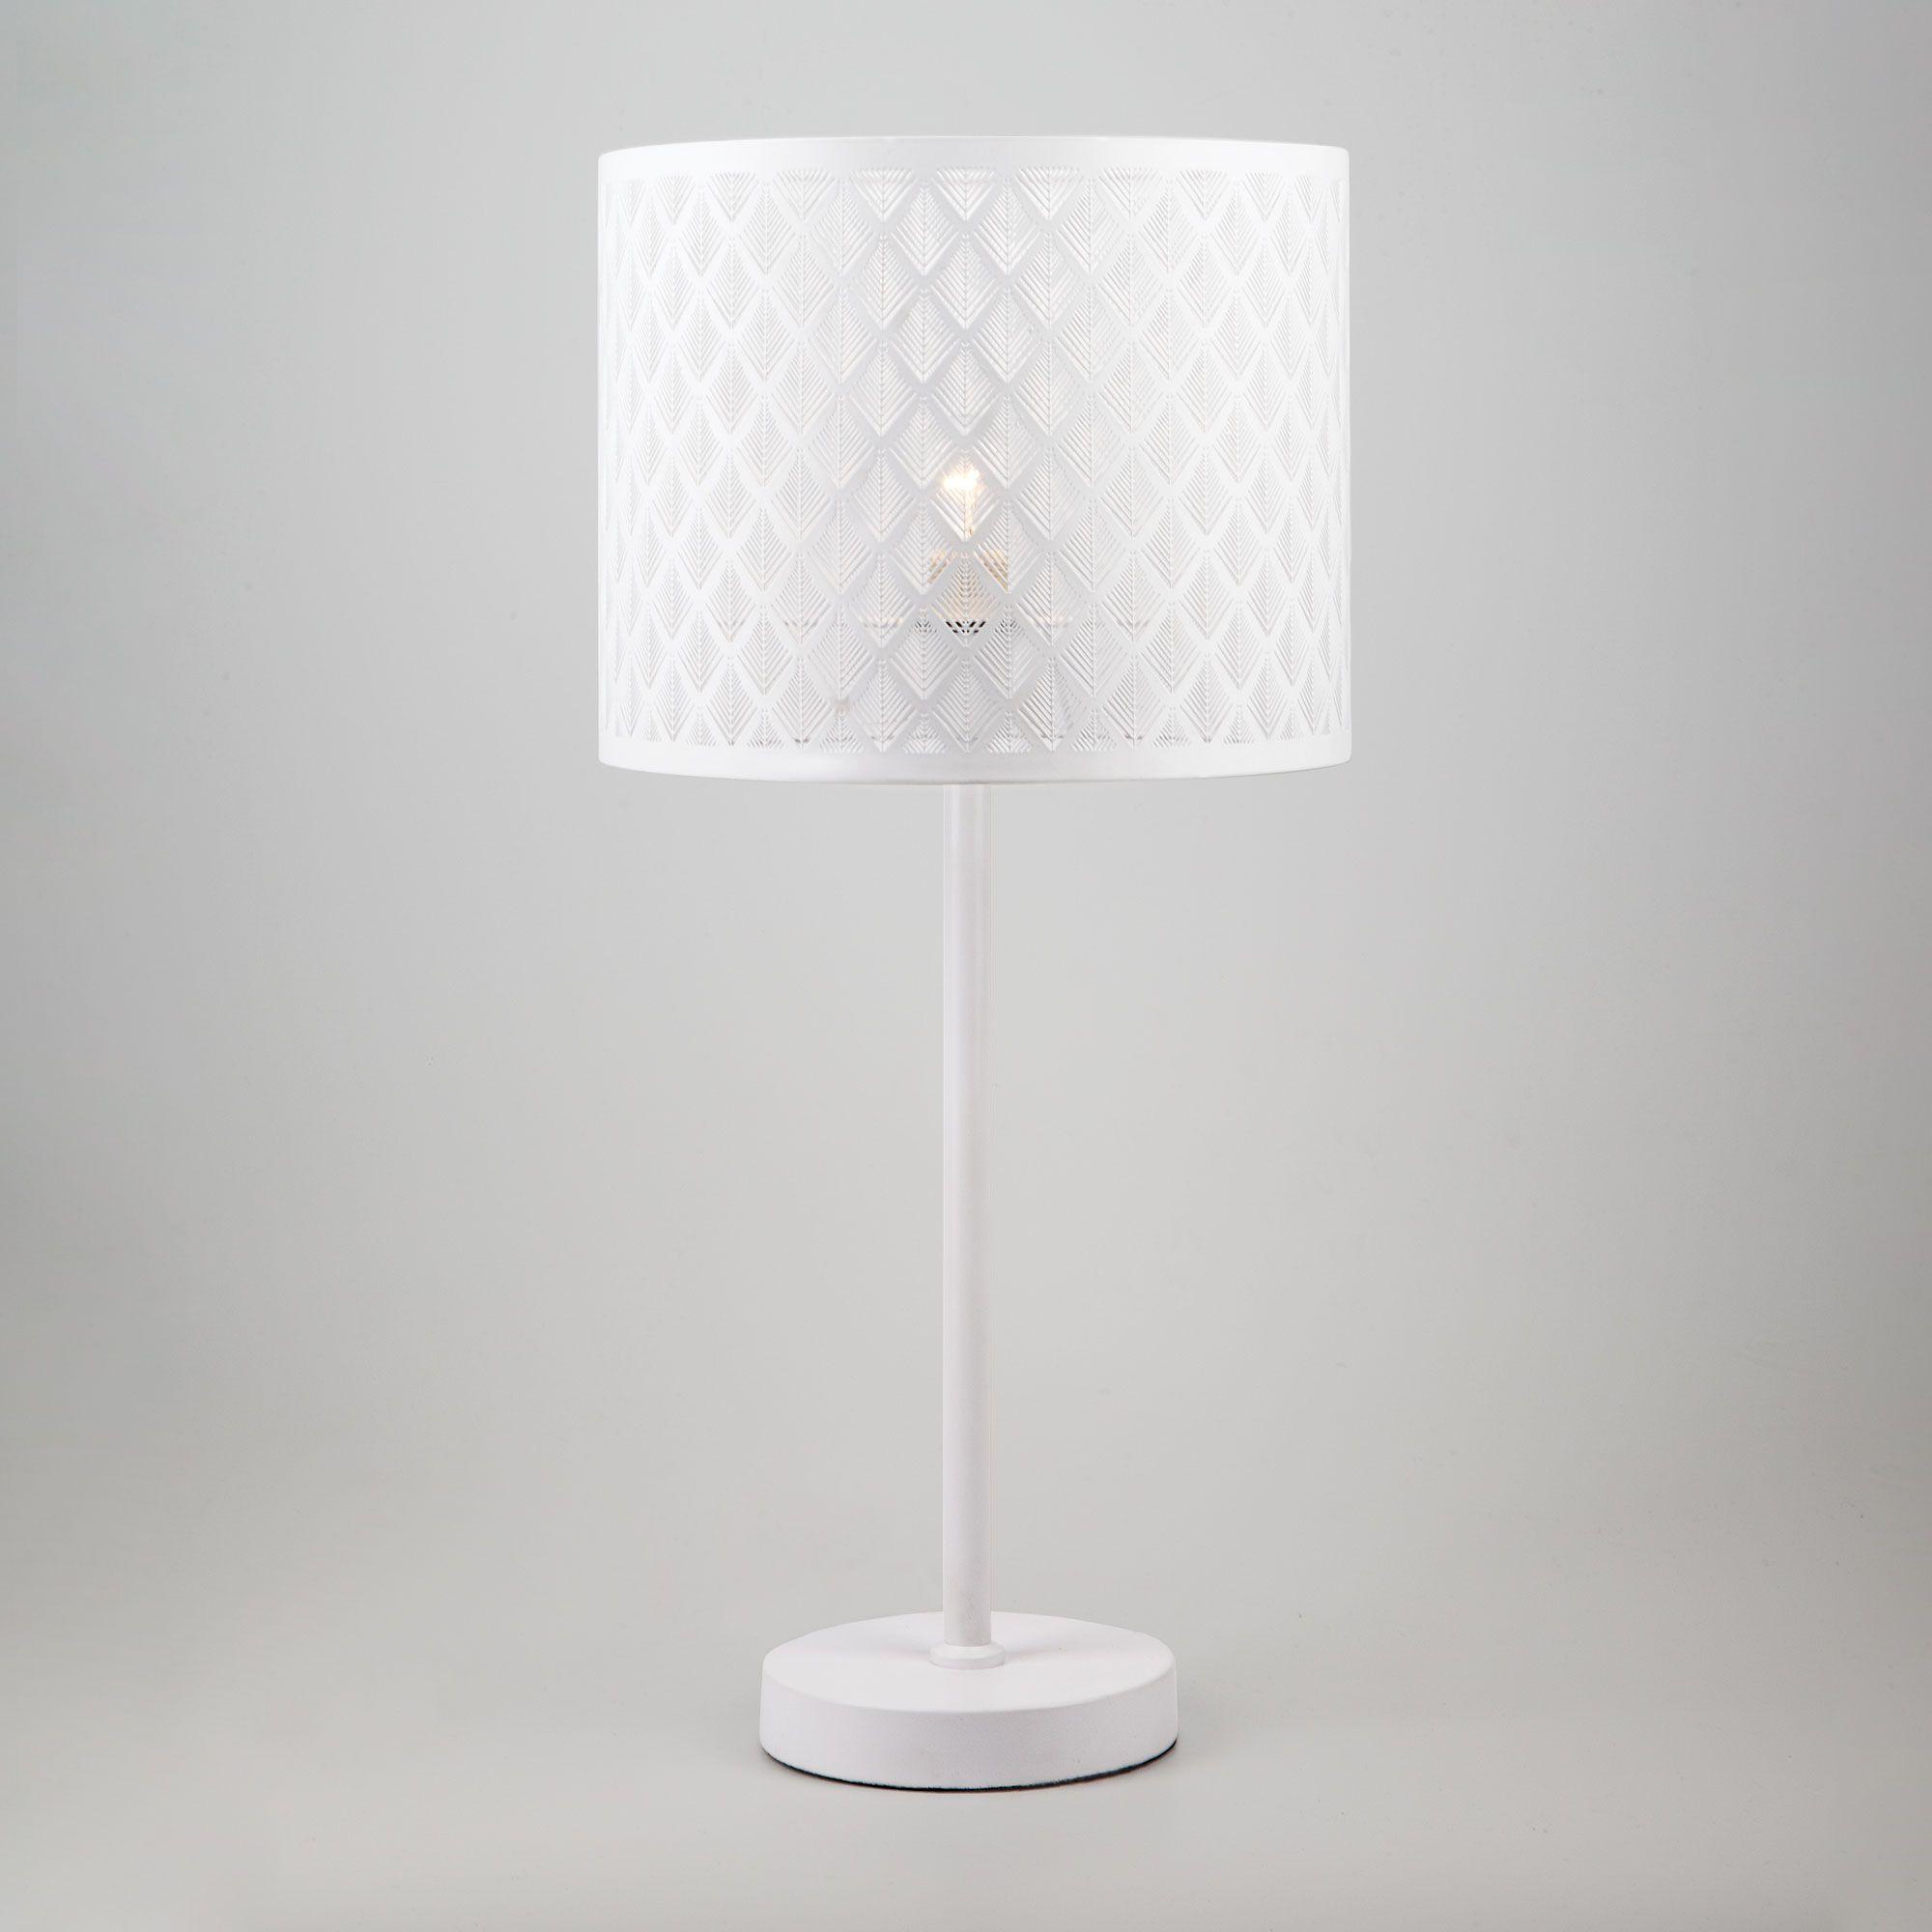 Настольная лампа СН-360 10 Вт, диммер, цвет белый в